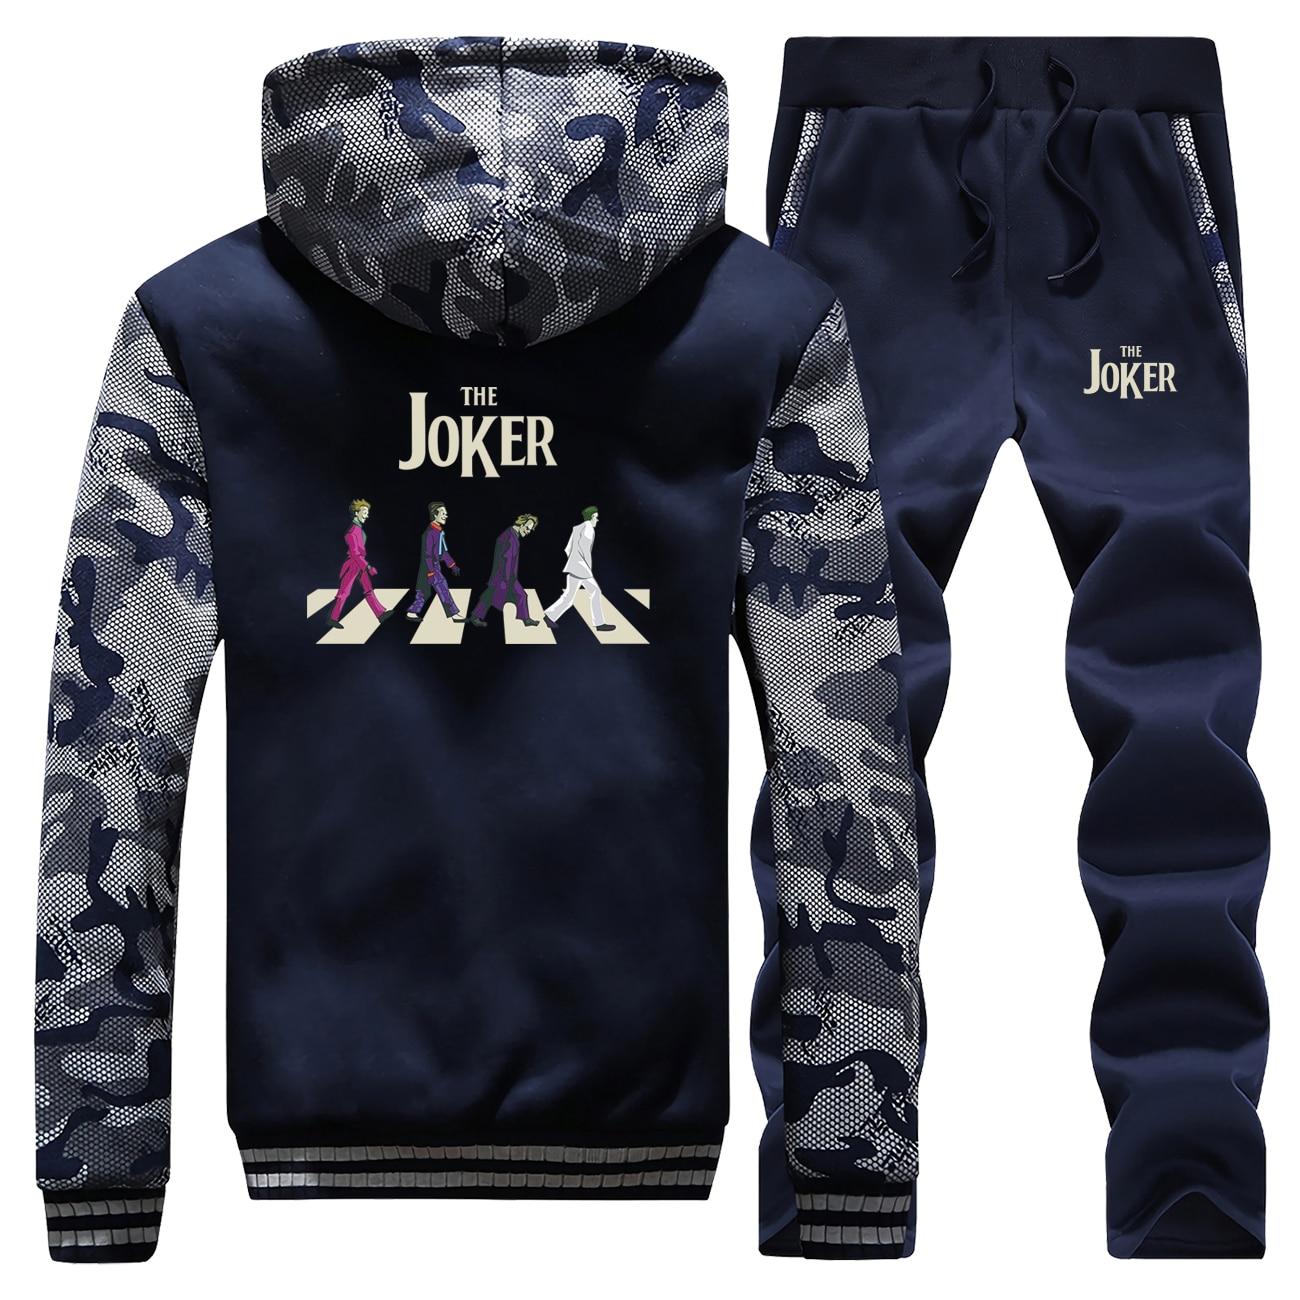 Funny Joker New Winter 2019 Retro Print Sweatshirt Mens Hooded Camouflage Warm Jackets Hip Hop Suit Coat Thick+2 Piece Set Pants